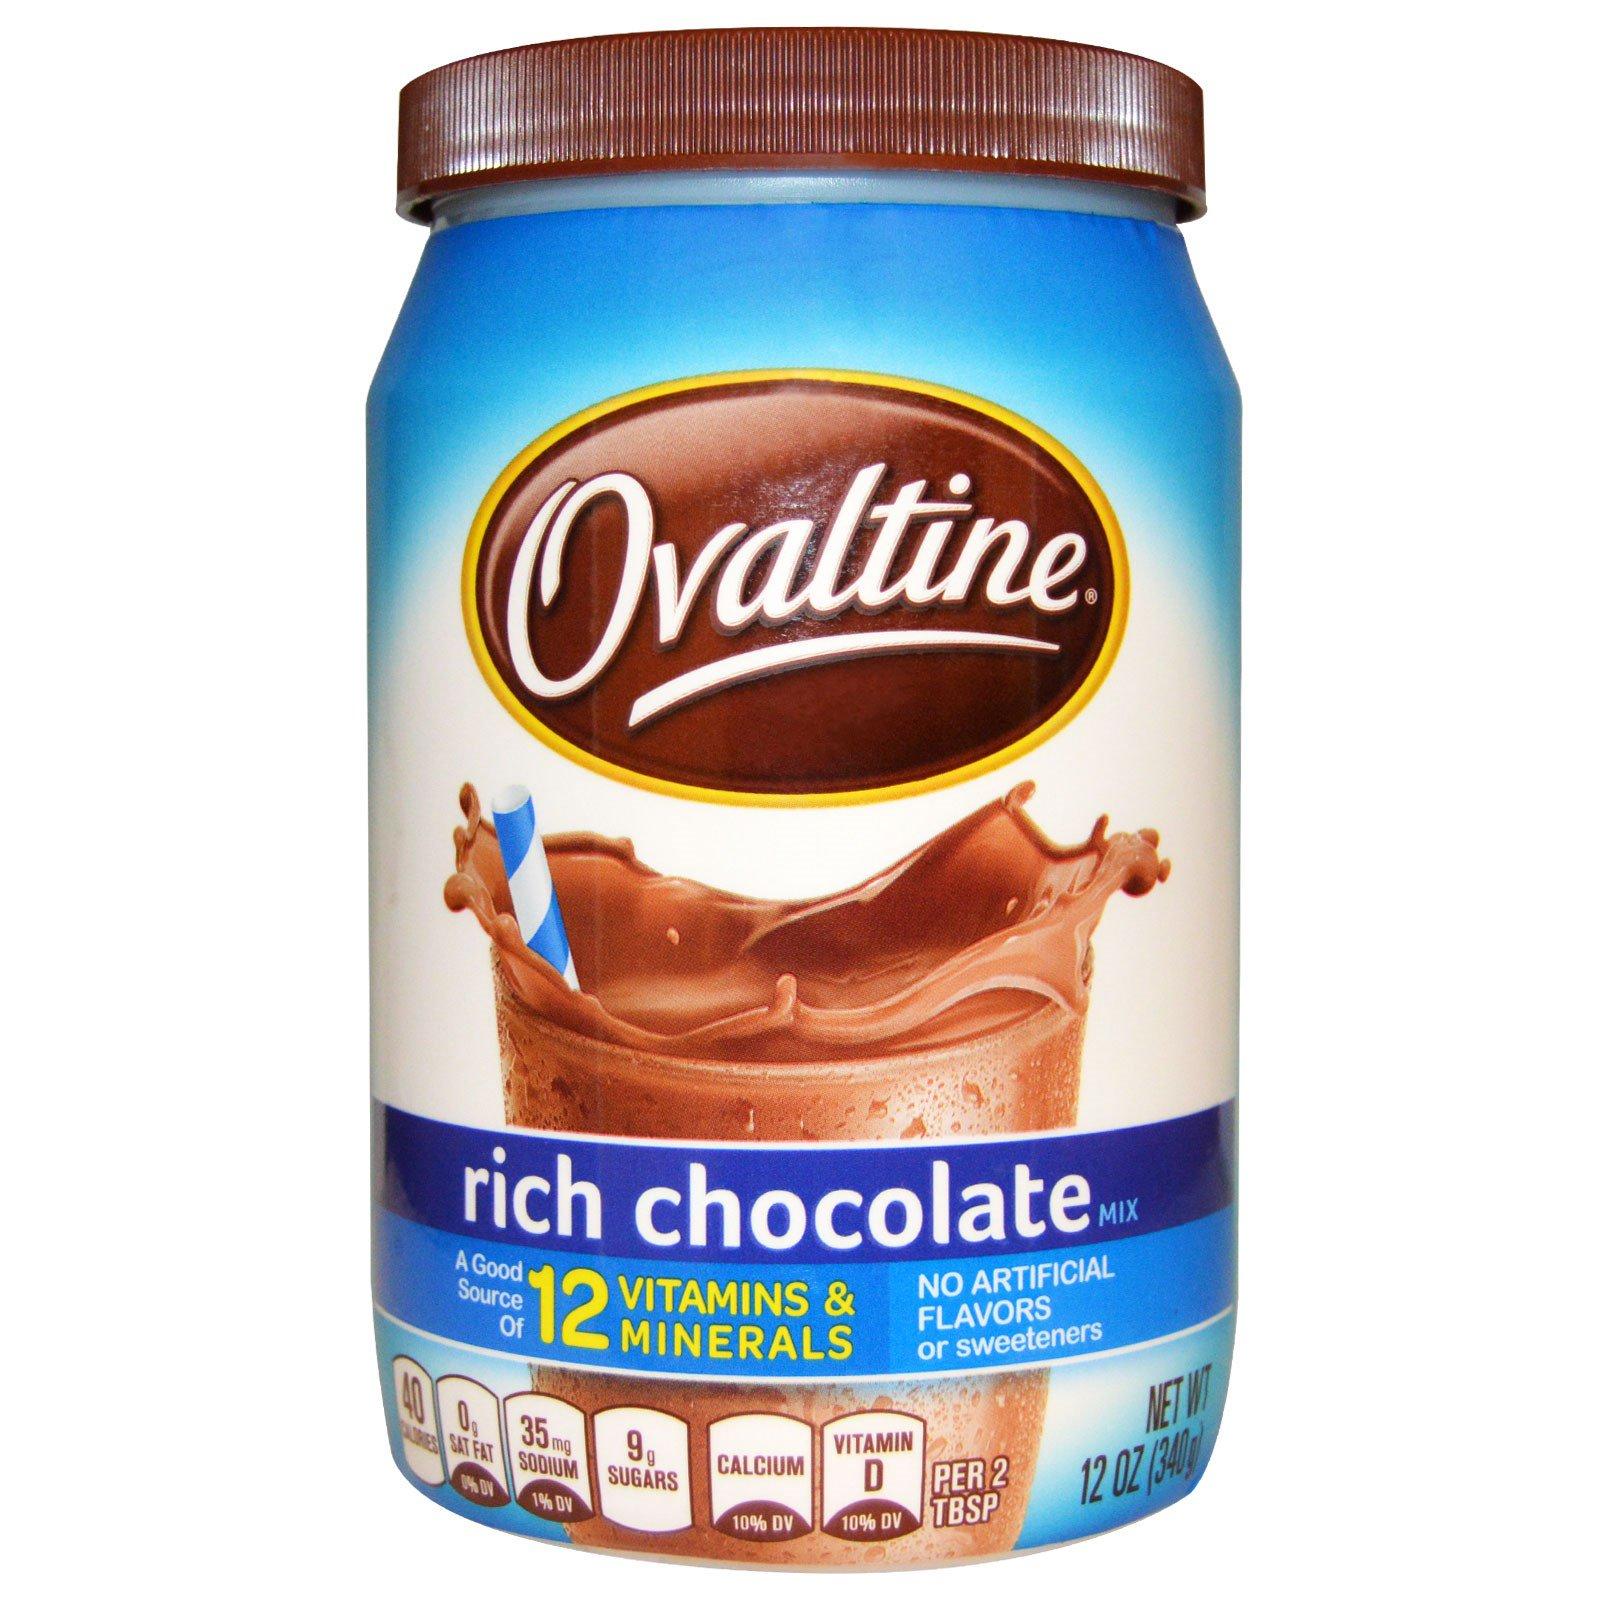 Ovaltine, Rich Chocolate Mix, 12 oz (340 g) - iHerb